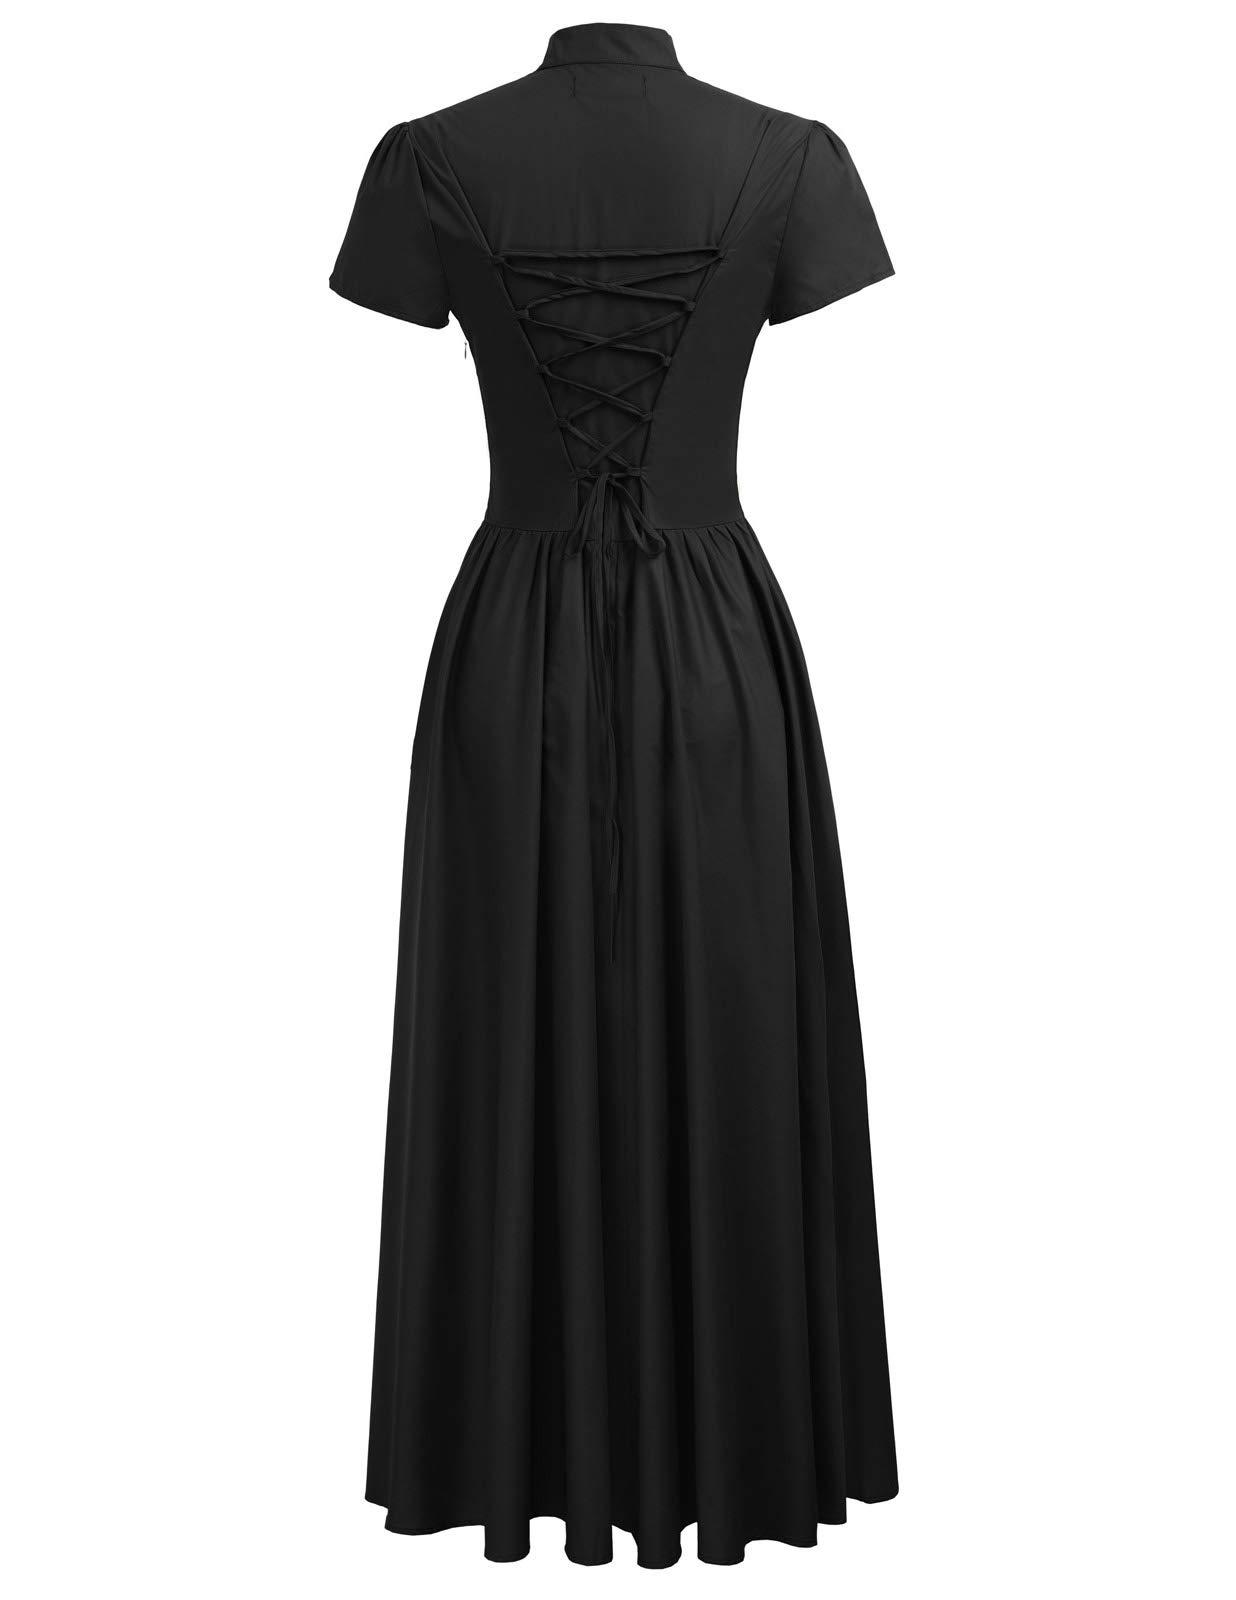 Women Victorian Vintage Steampunk Short Sleeve V-Neck Long Dress 5